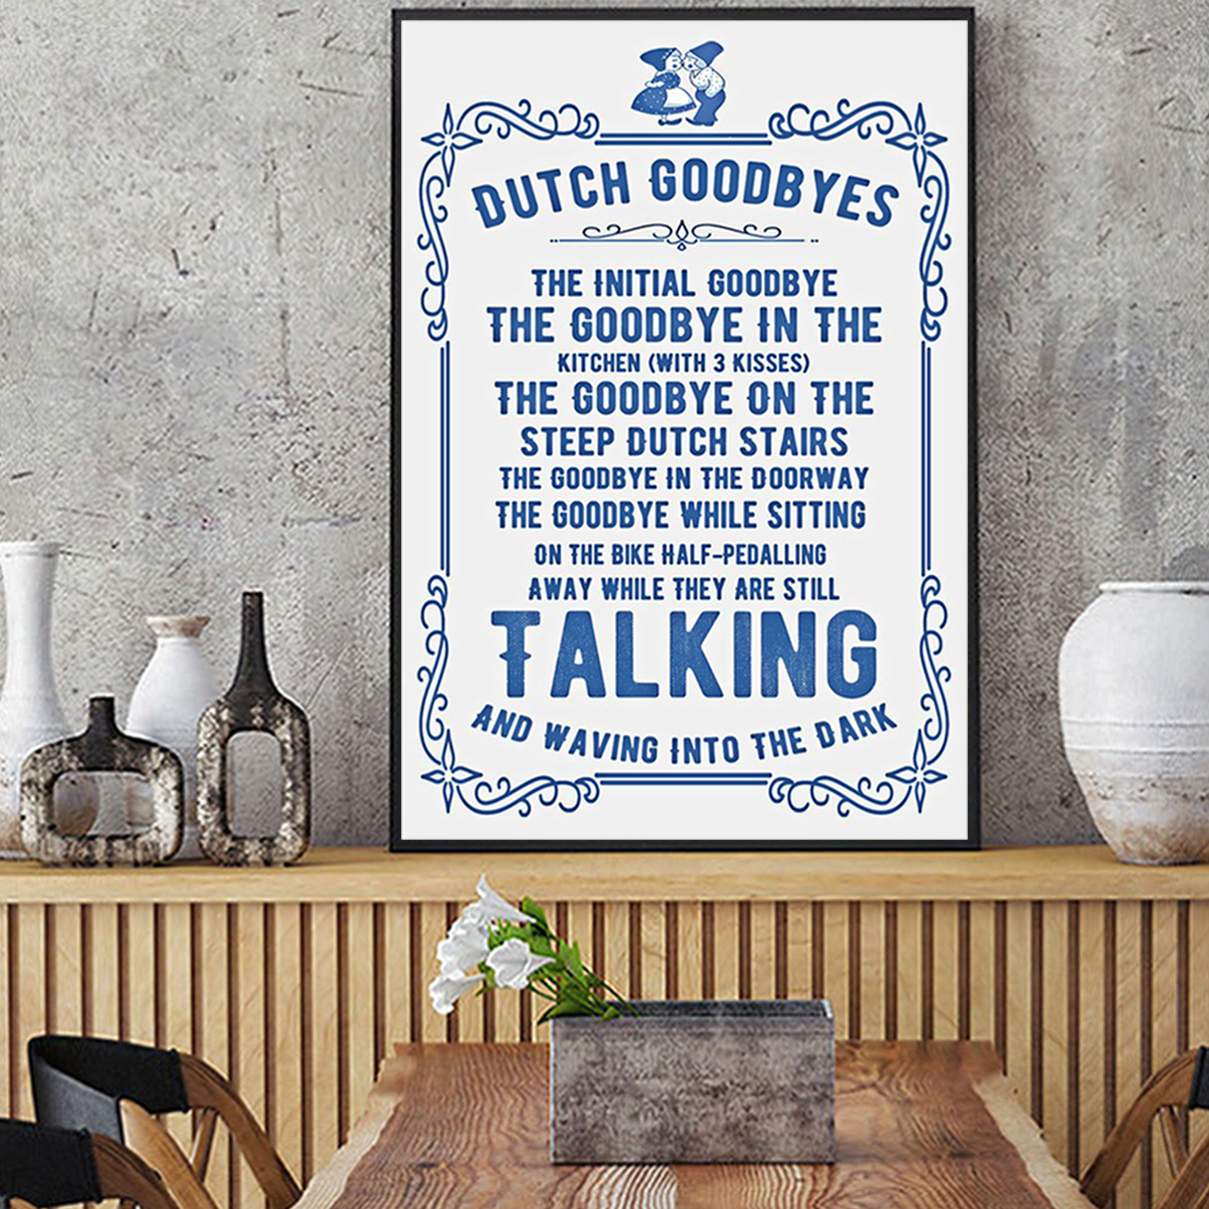 Dutch goodbyes vertical poster A1